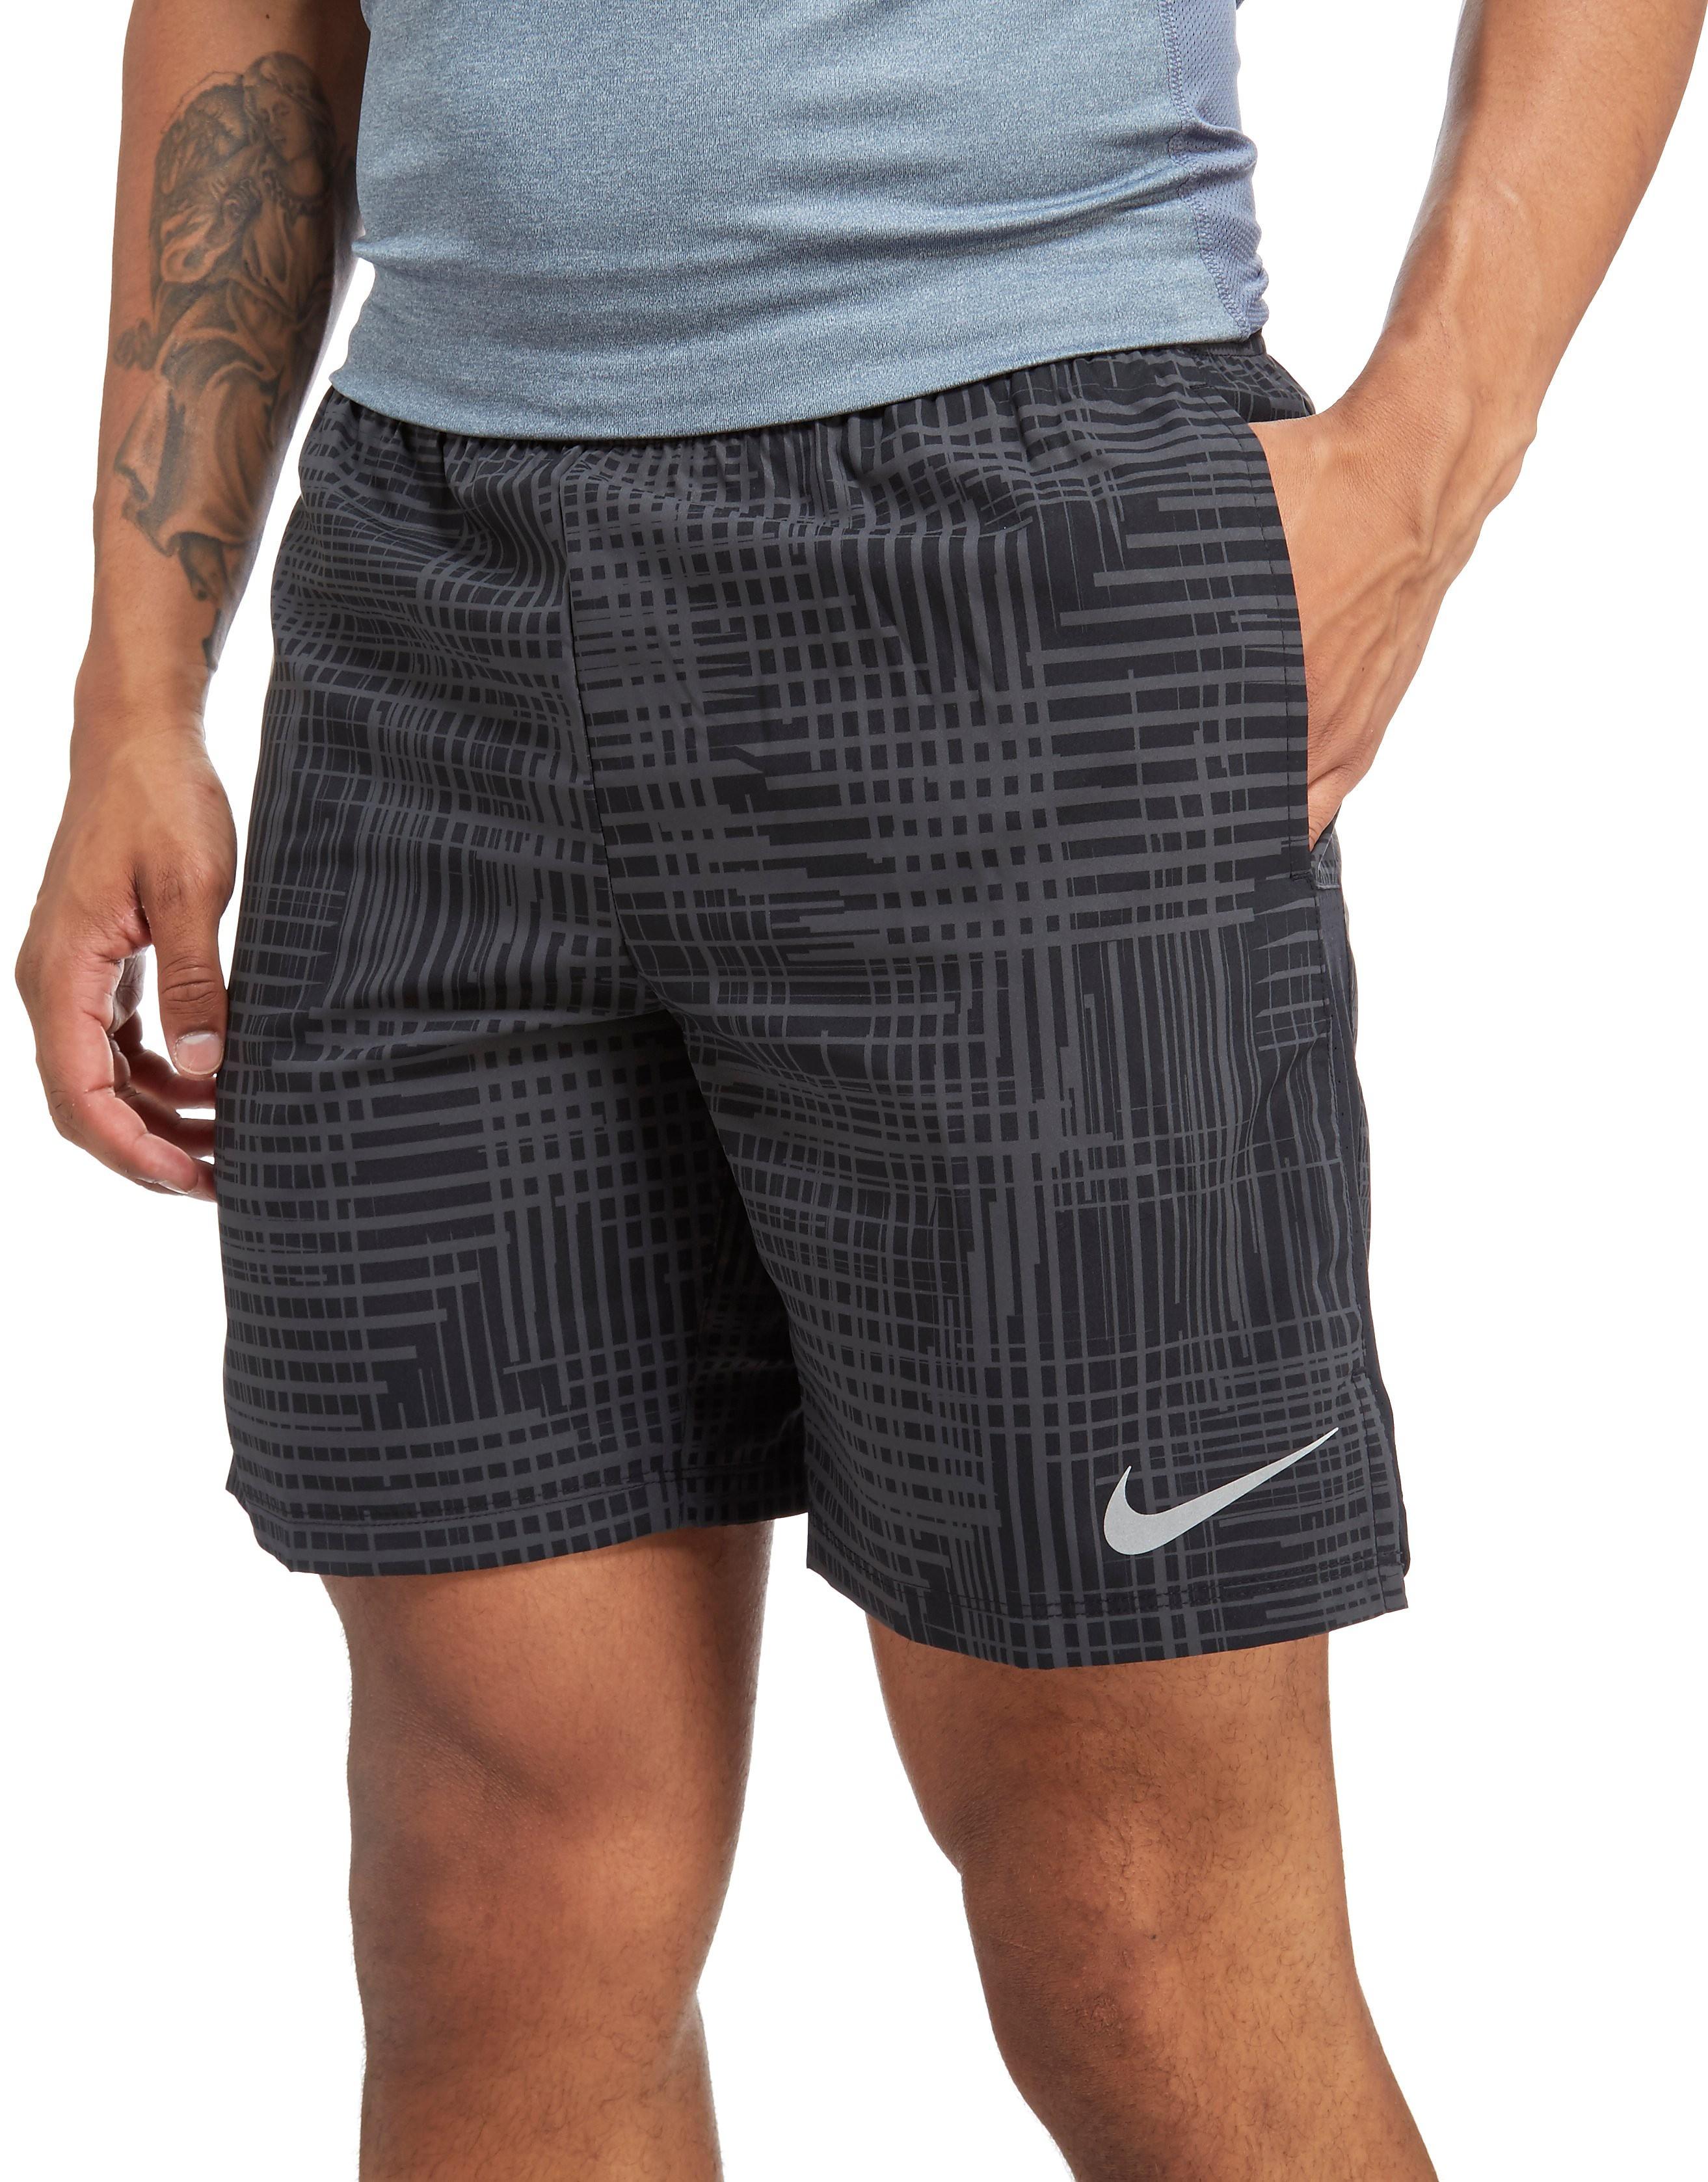 Nike Challenger 7 Performance Shorts